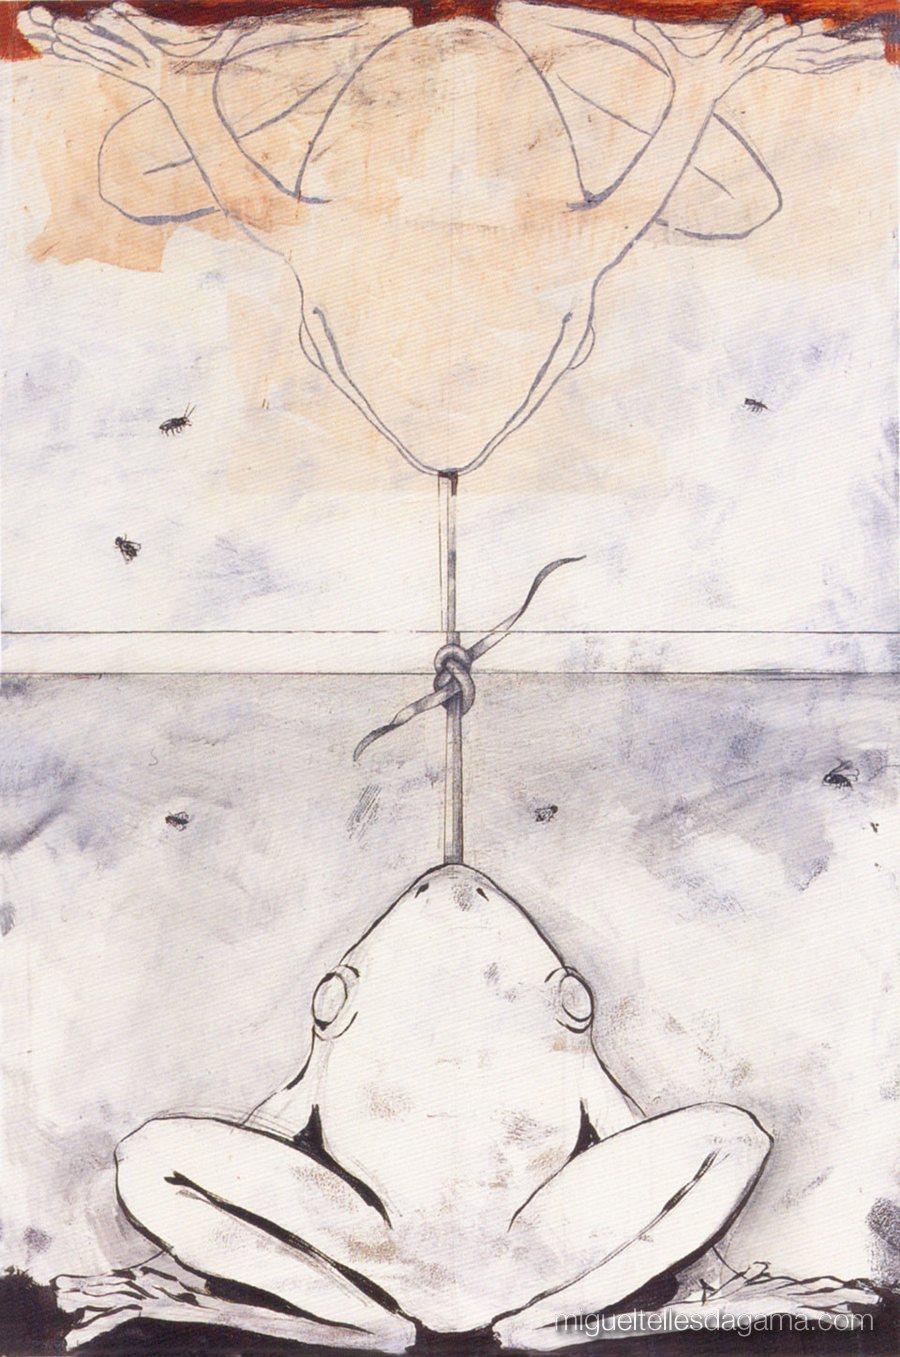 Galeria 111, 1997 - Sem título, Acrílico sobre tela (139 x 92 cm)